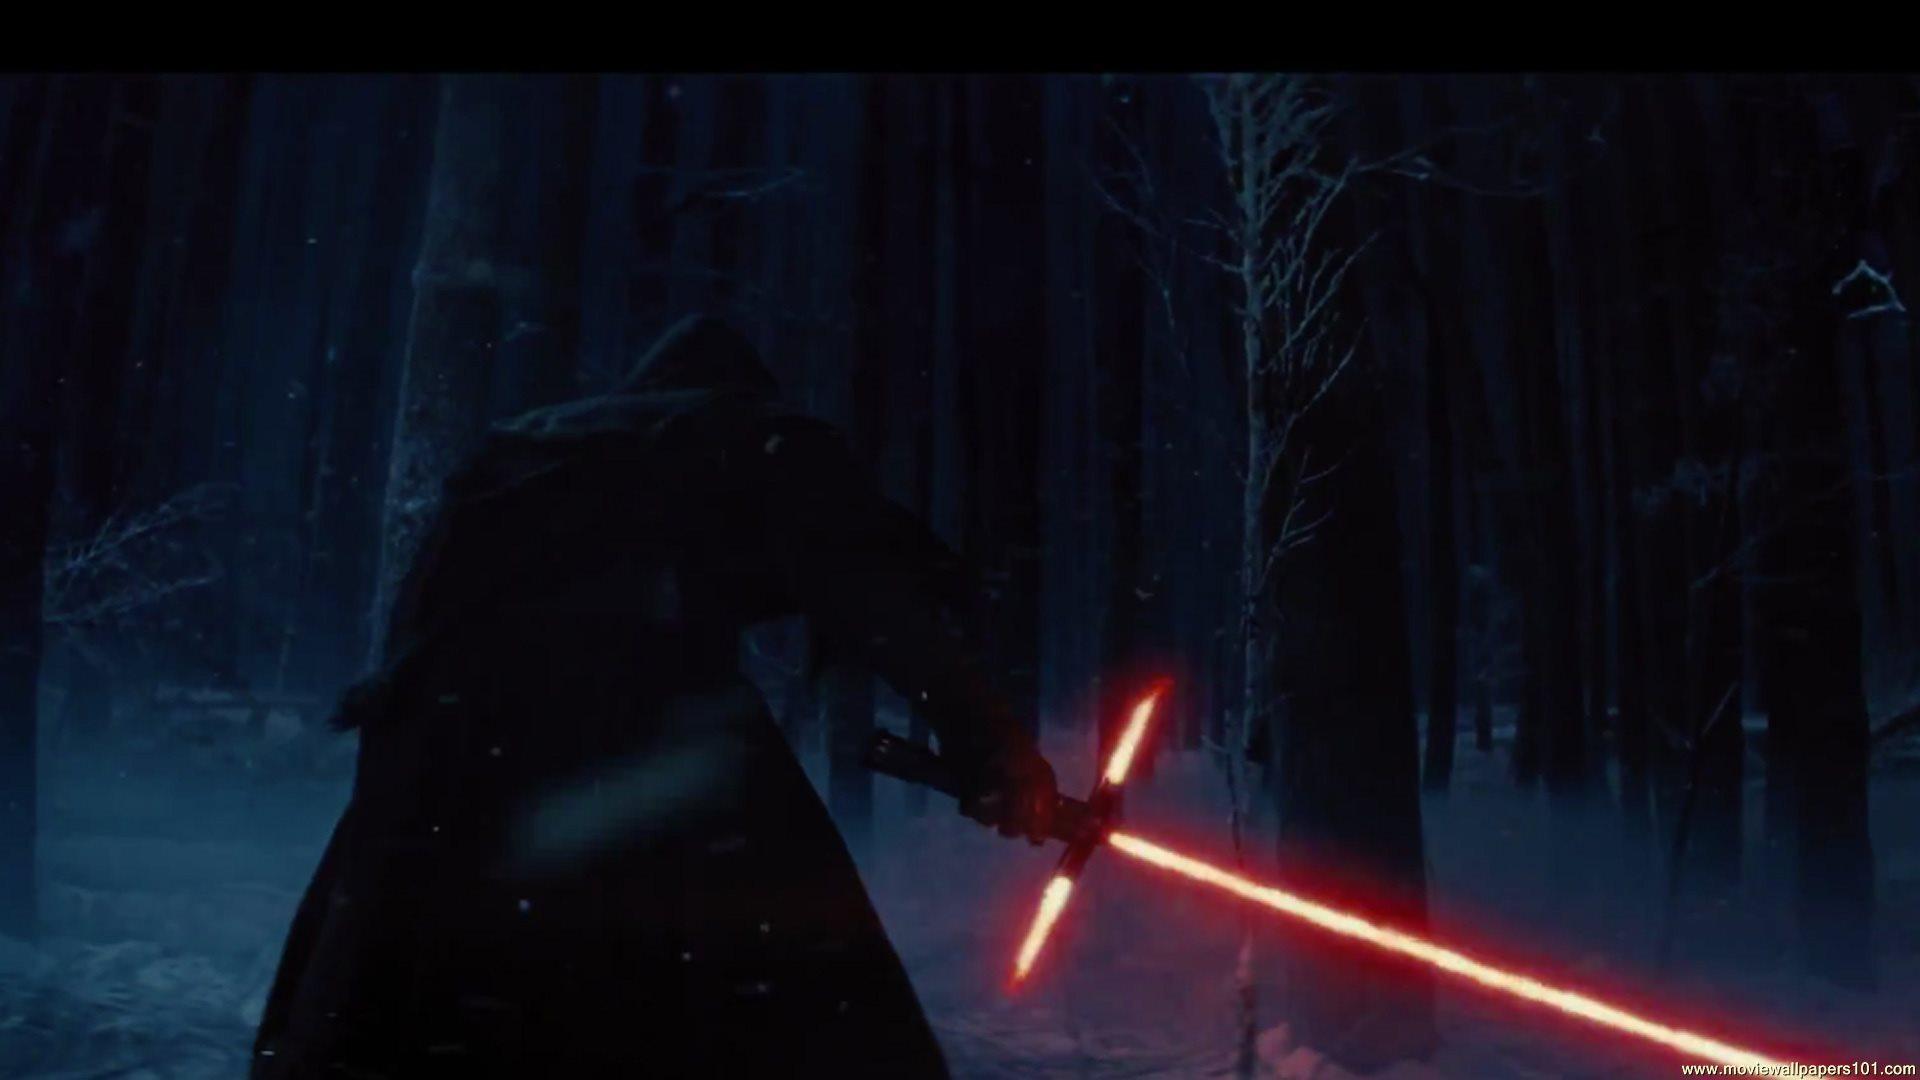 Download Star Wars Episode VII The Force Awakens Movie Wallpaper 1920x1080